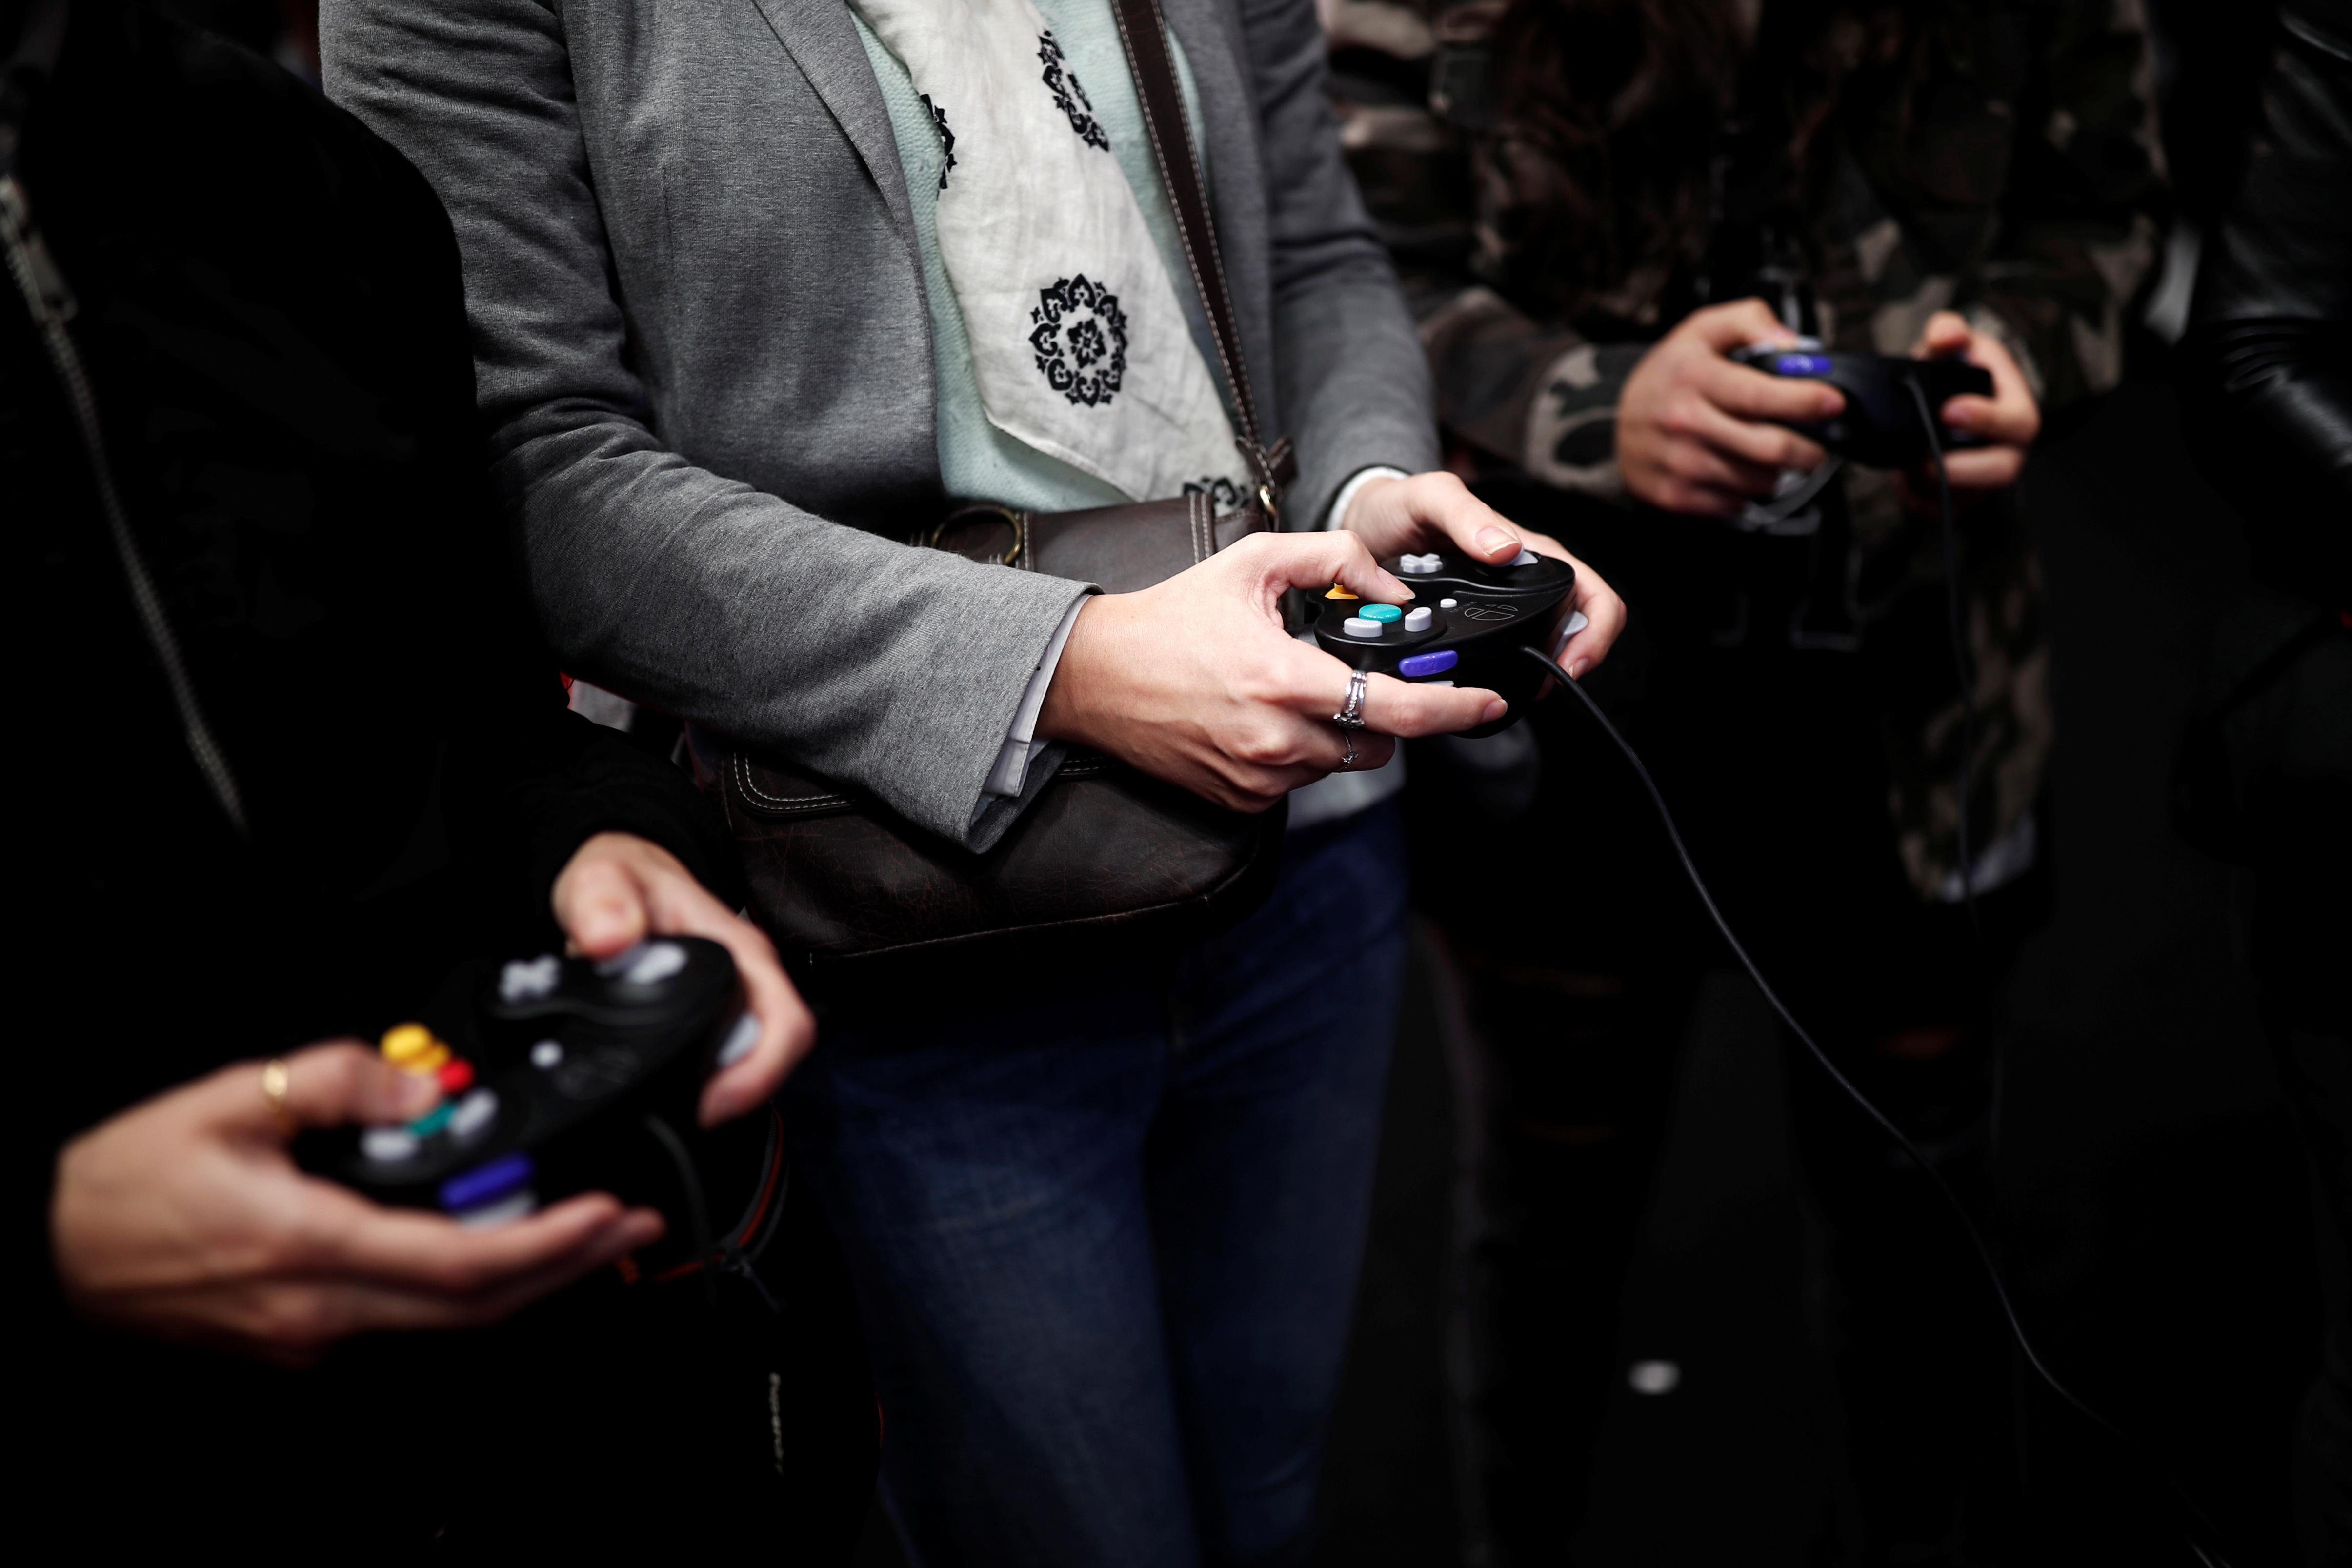 Sony, Nintendo seen scoring strong third-quarter earnings as console